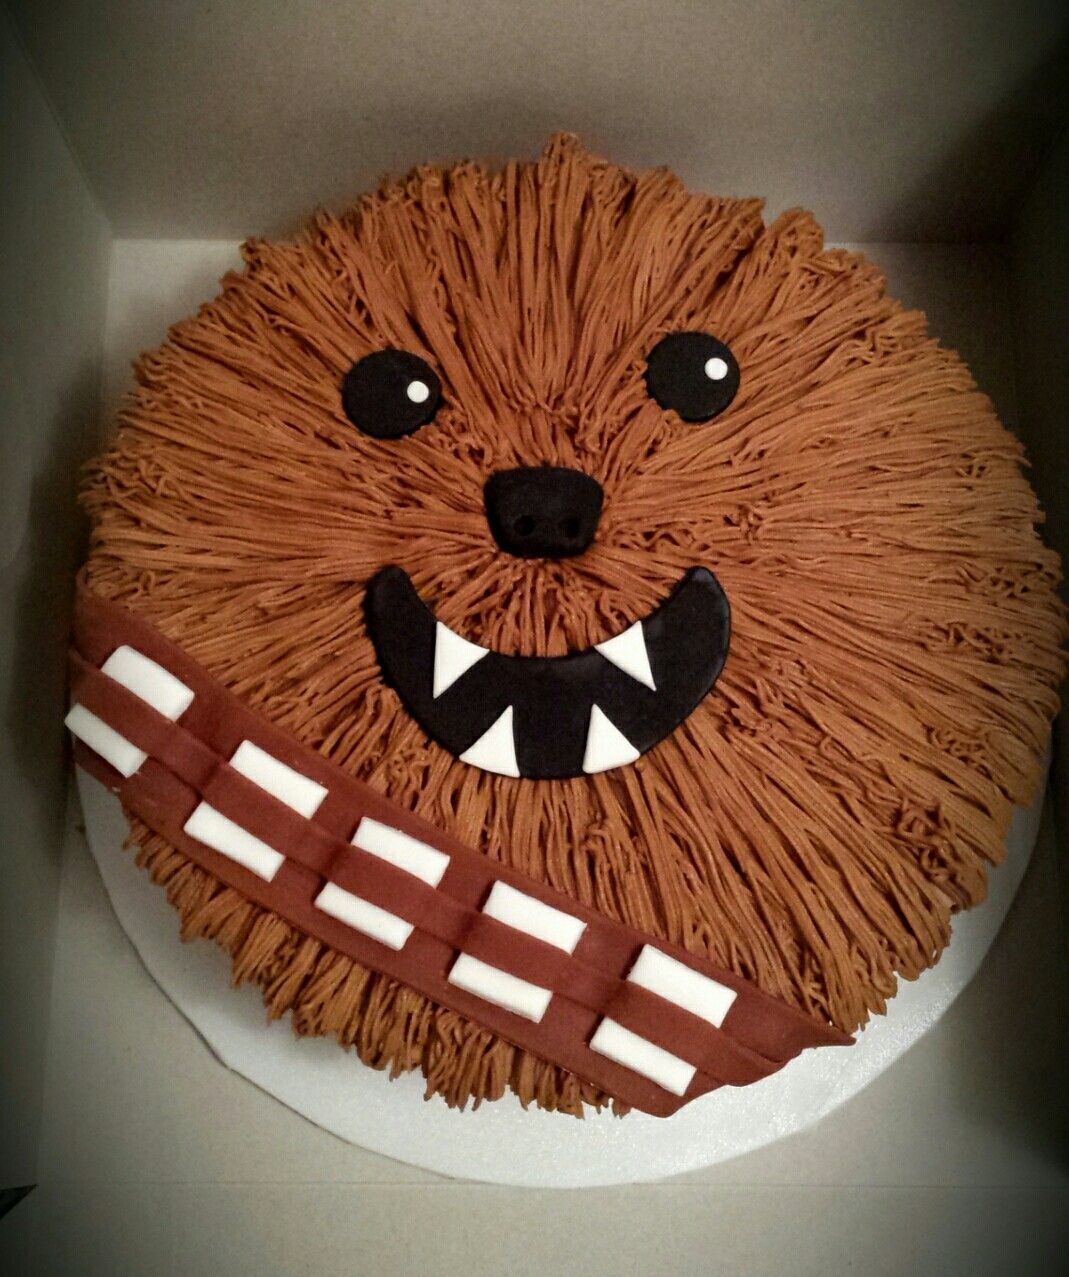 chewbacca birthday cake i made this cakes in 2018